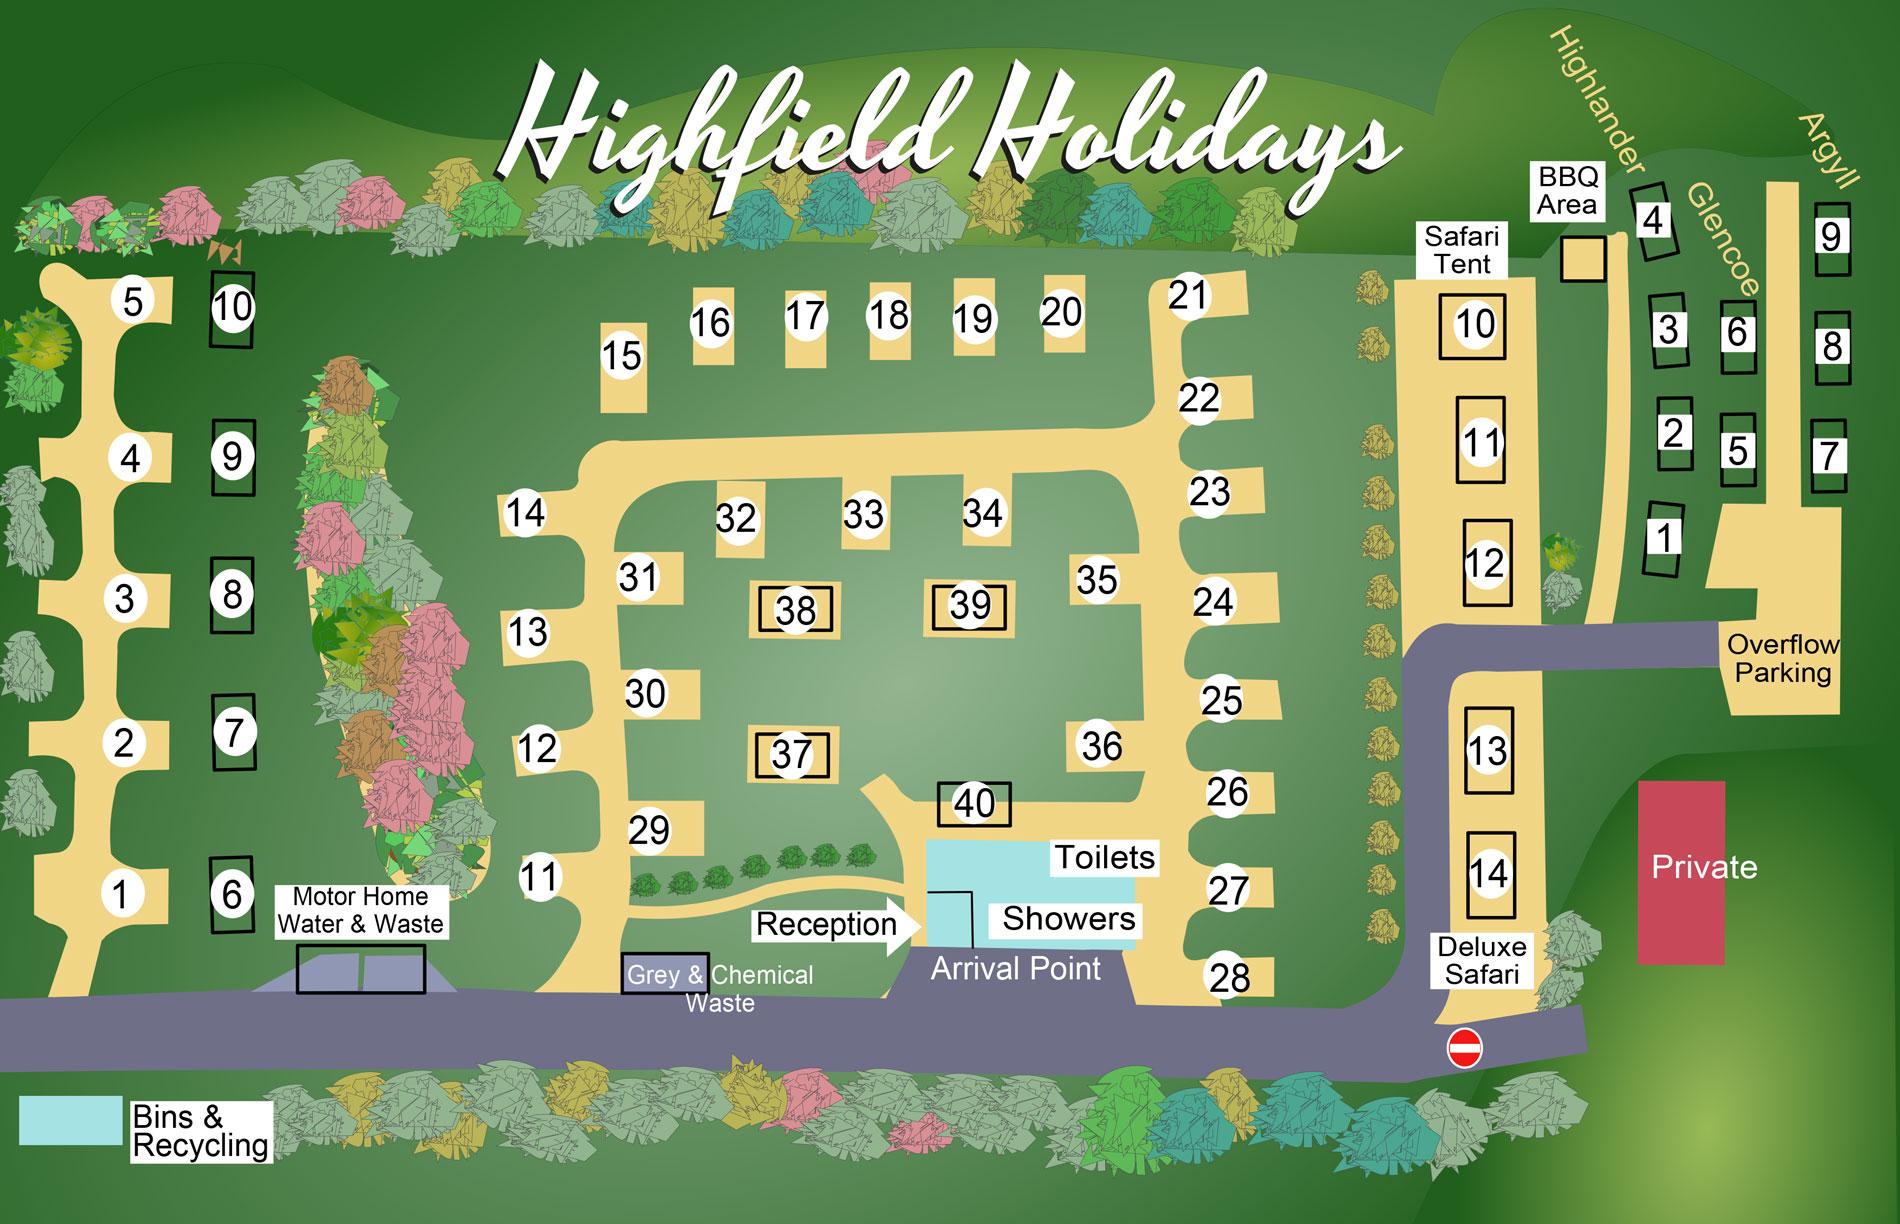 Highfield Holidays Park Map